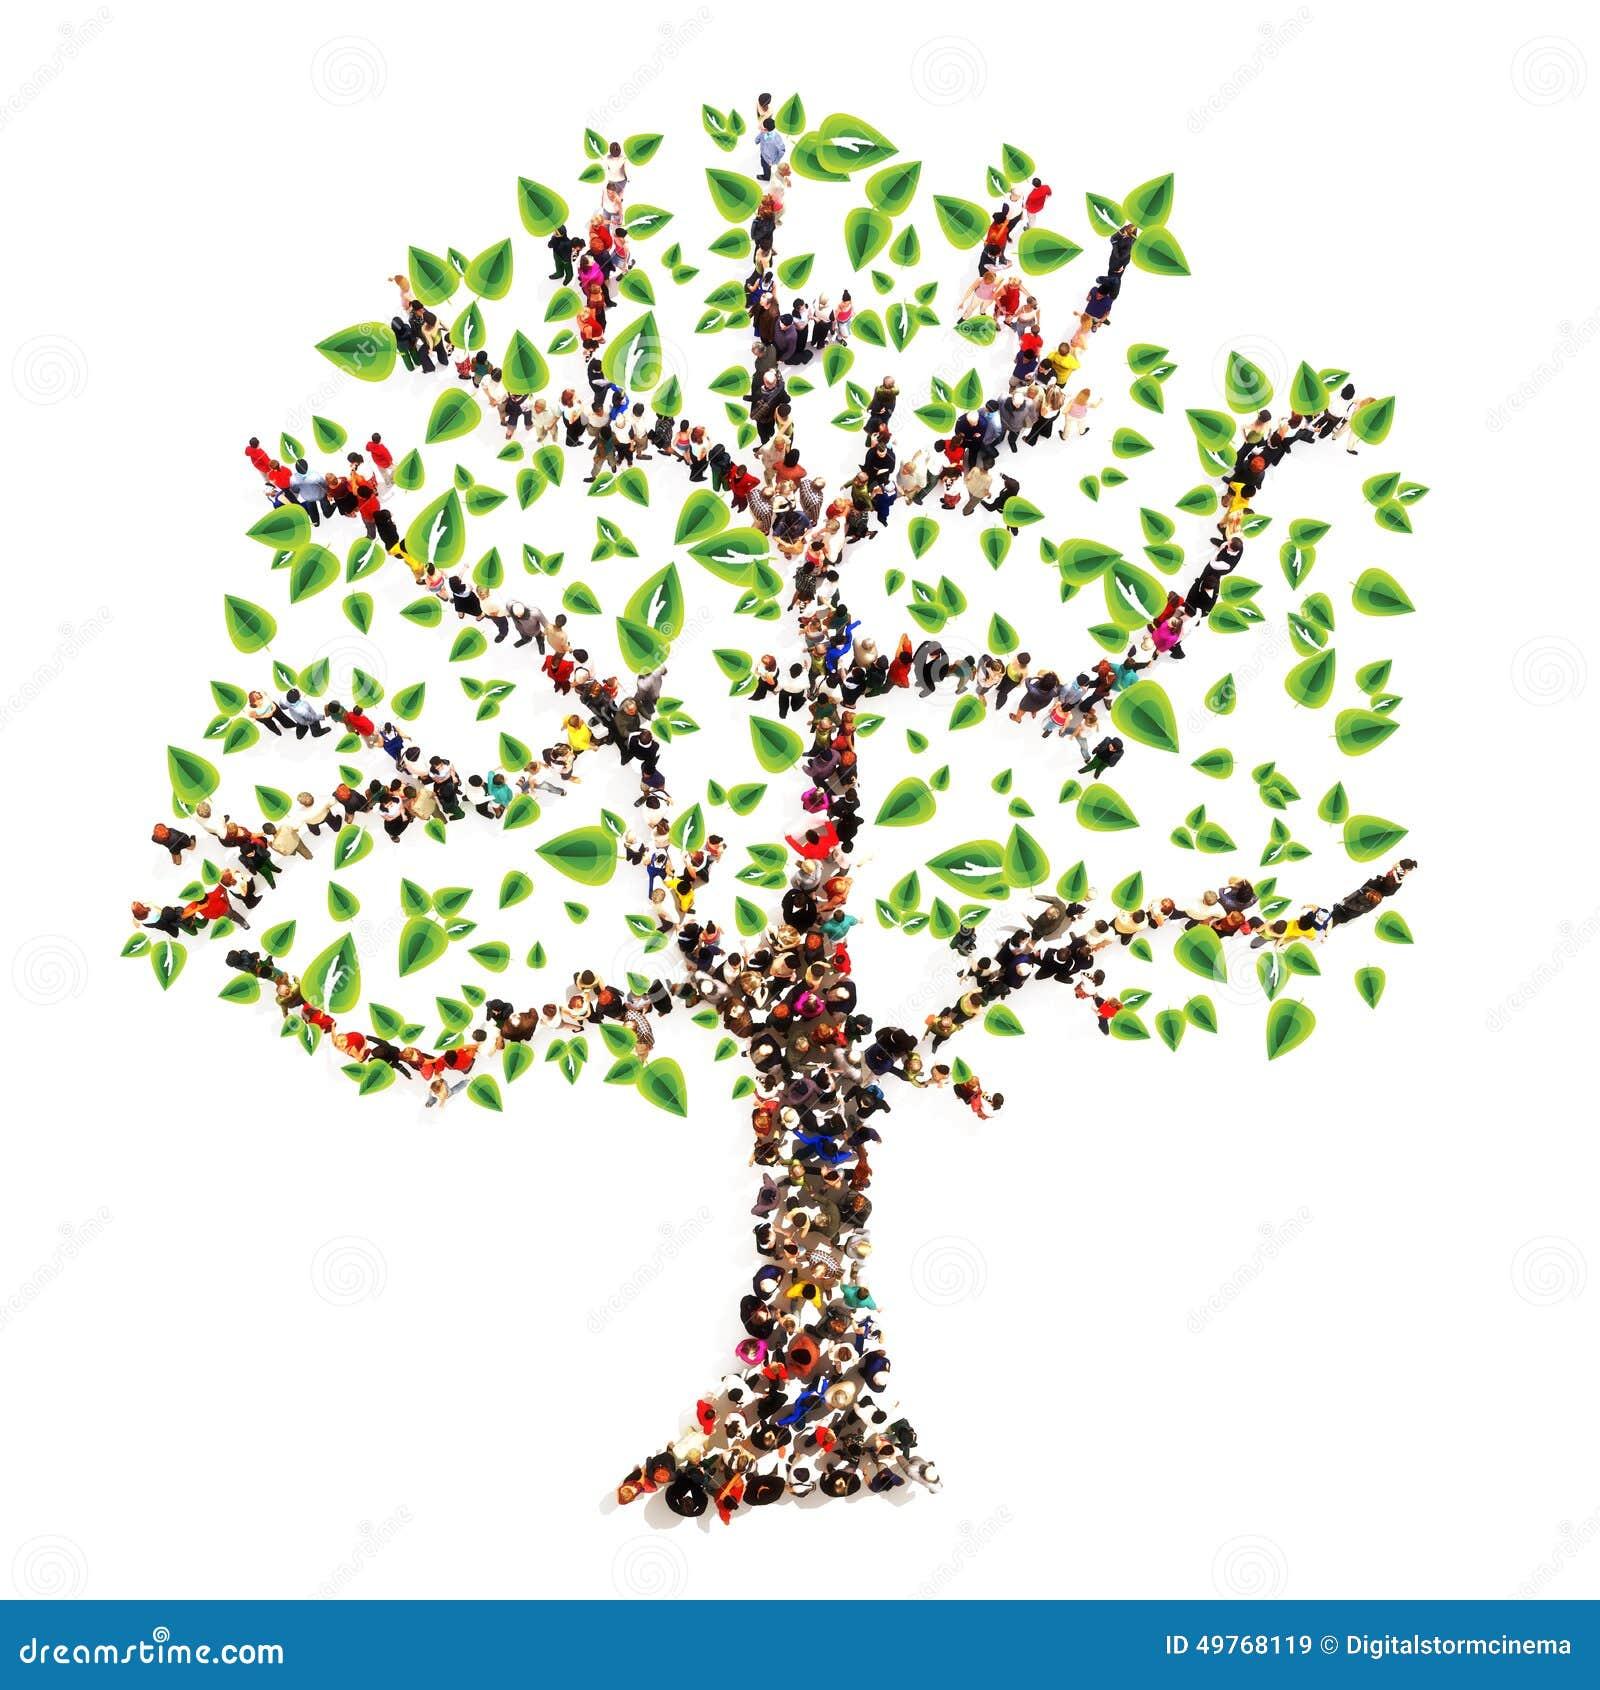 Arbre g n alogique illustration stock image 49768119 - Idee arbre genealogique original ...